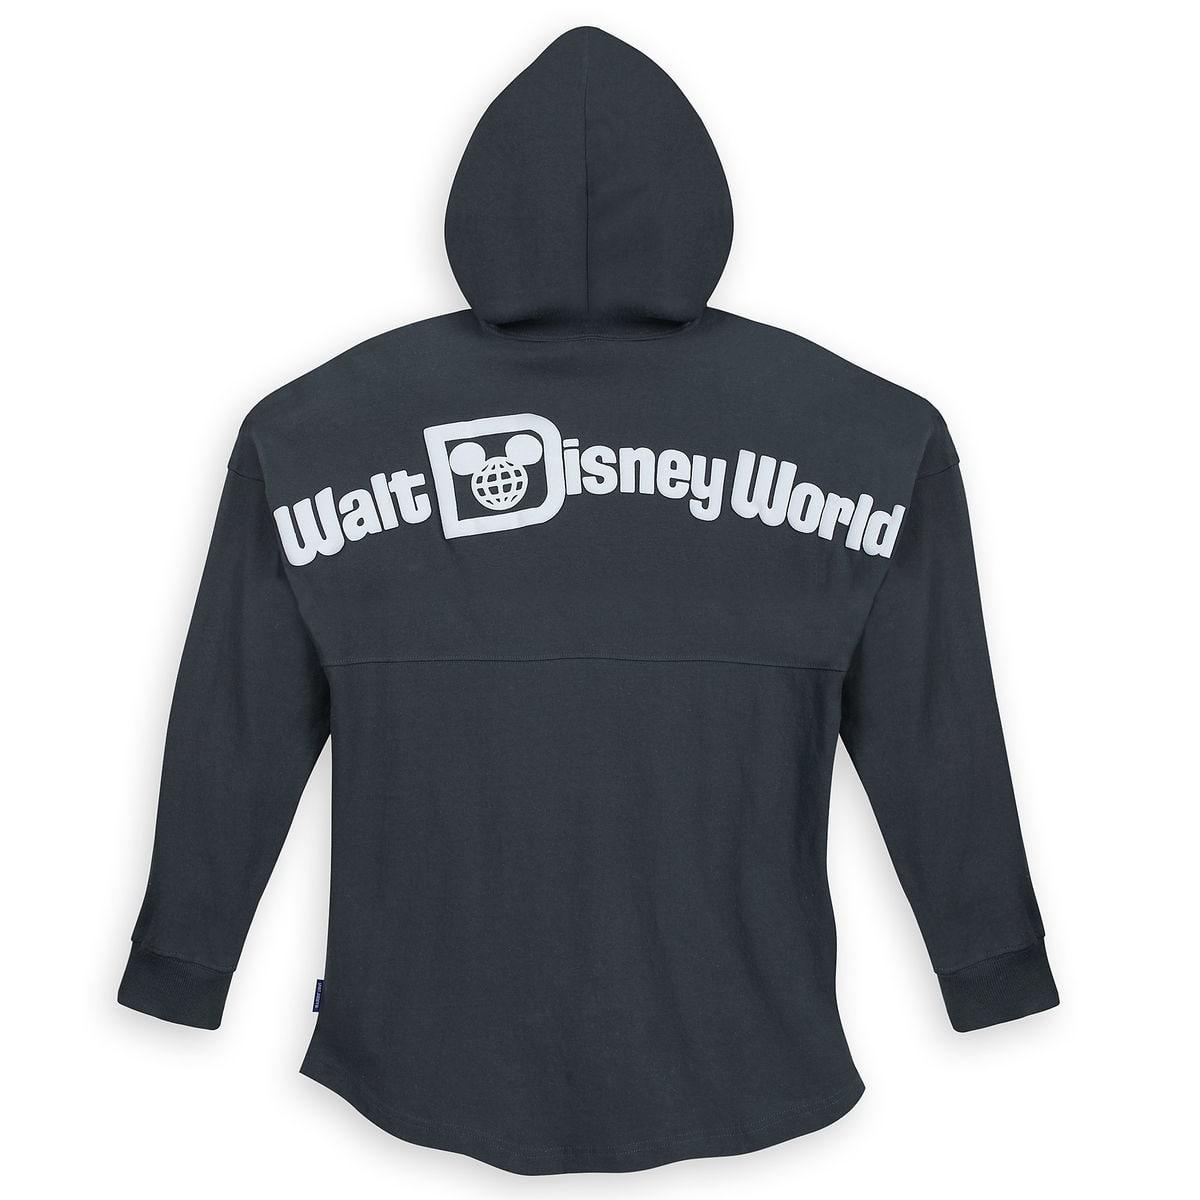 503c1337005 Disney Spirit Jersey Hoodie for Adults - Walt Disney World - Gray. Tap to  expand